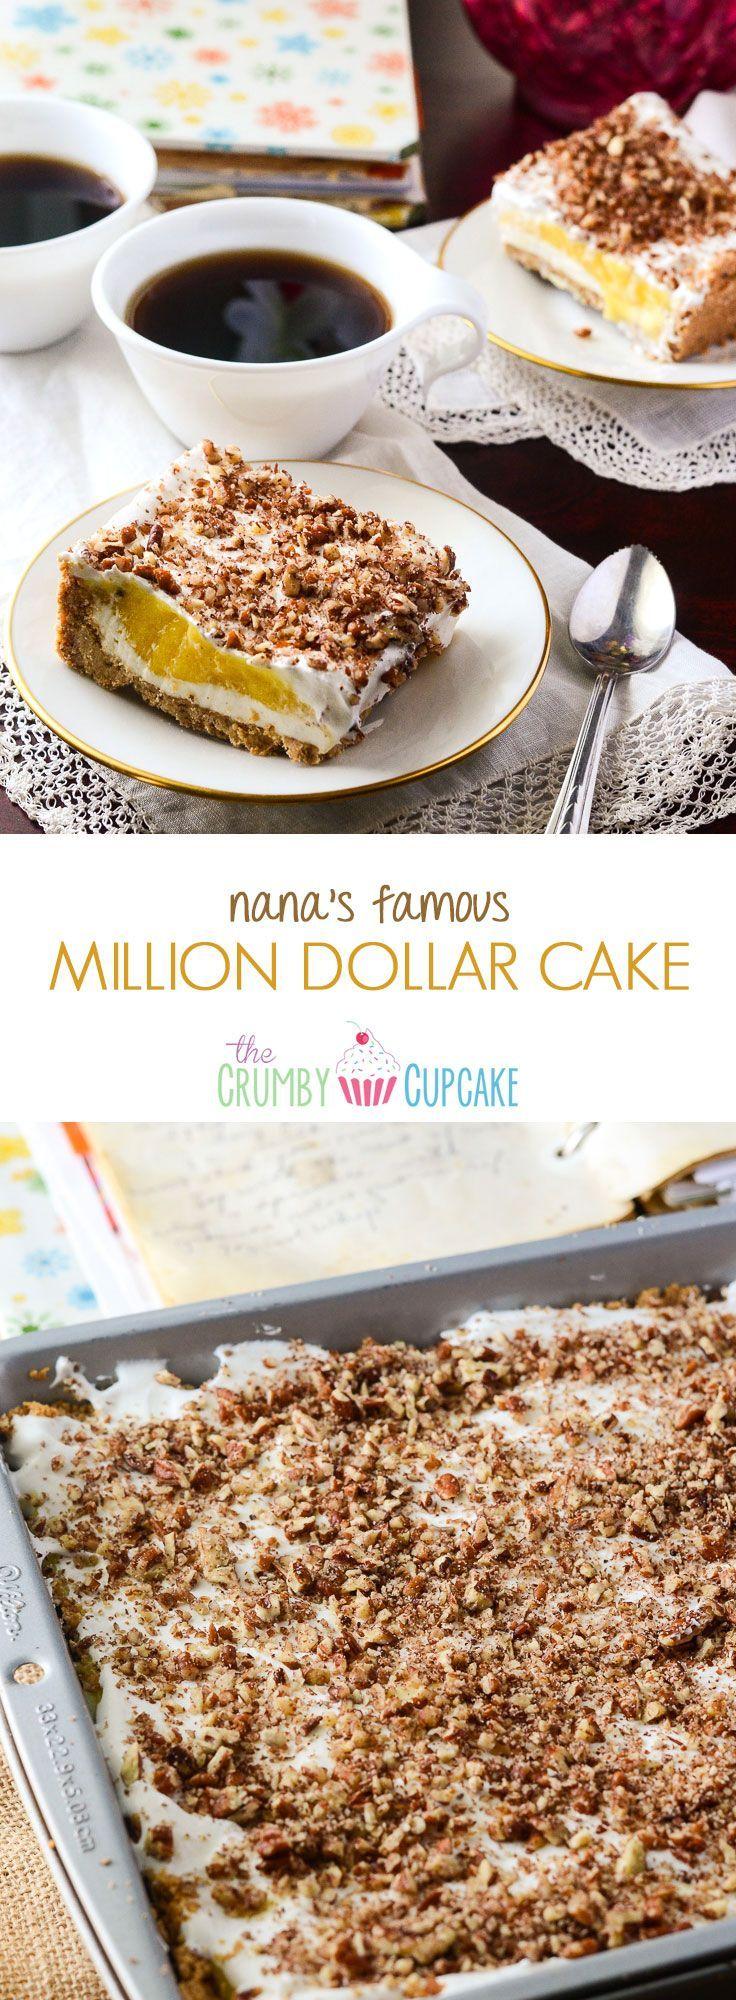 Nana's Million Dollar Cake | A light, refreshing cheesecake-style pudding cake, pulled from Nana's handwritten vintage cookbook! #SundaySupper